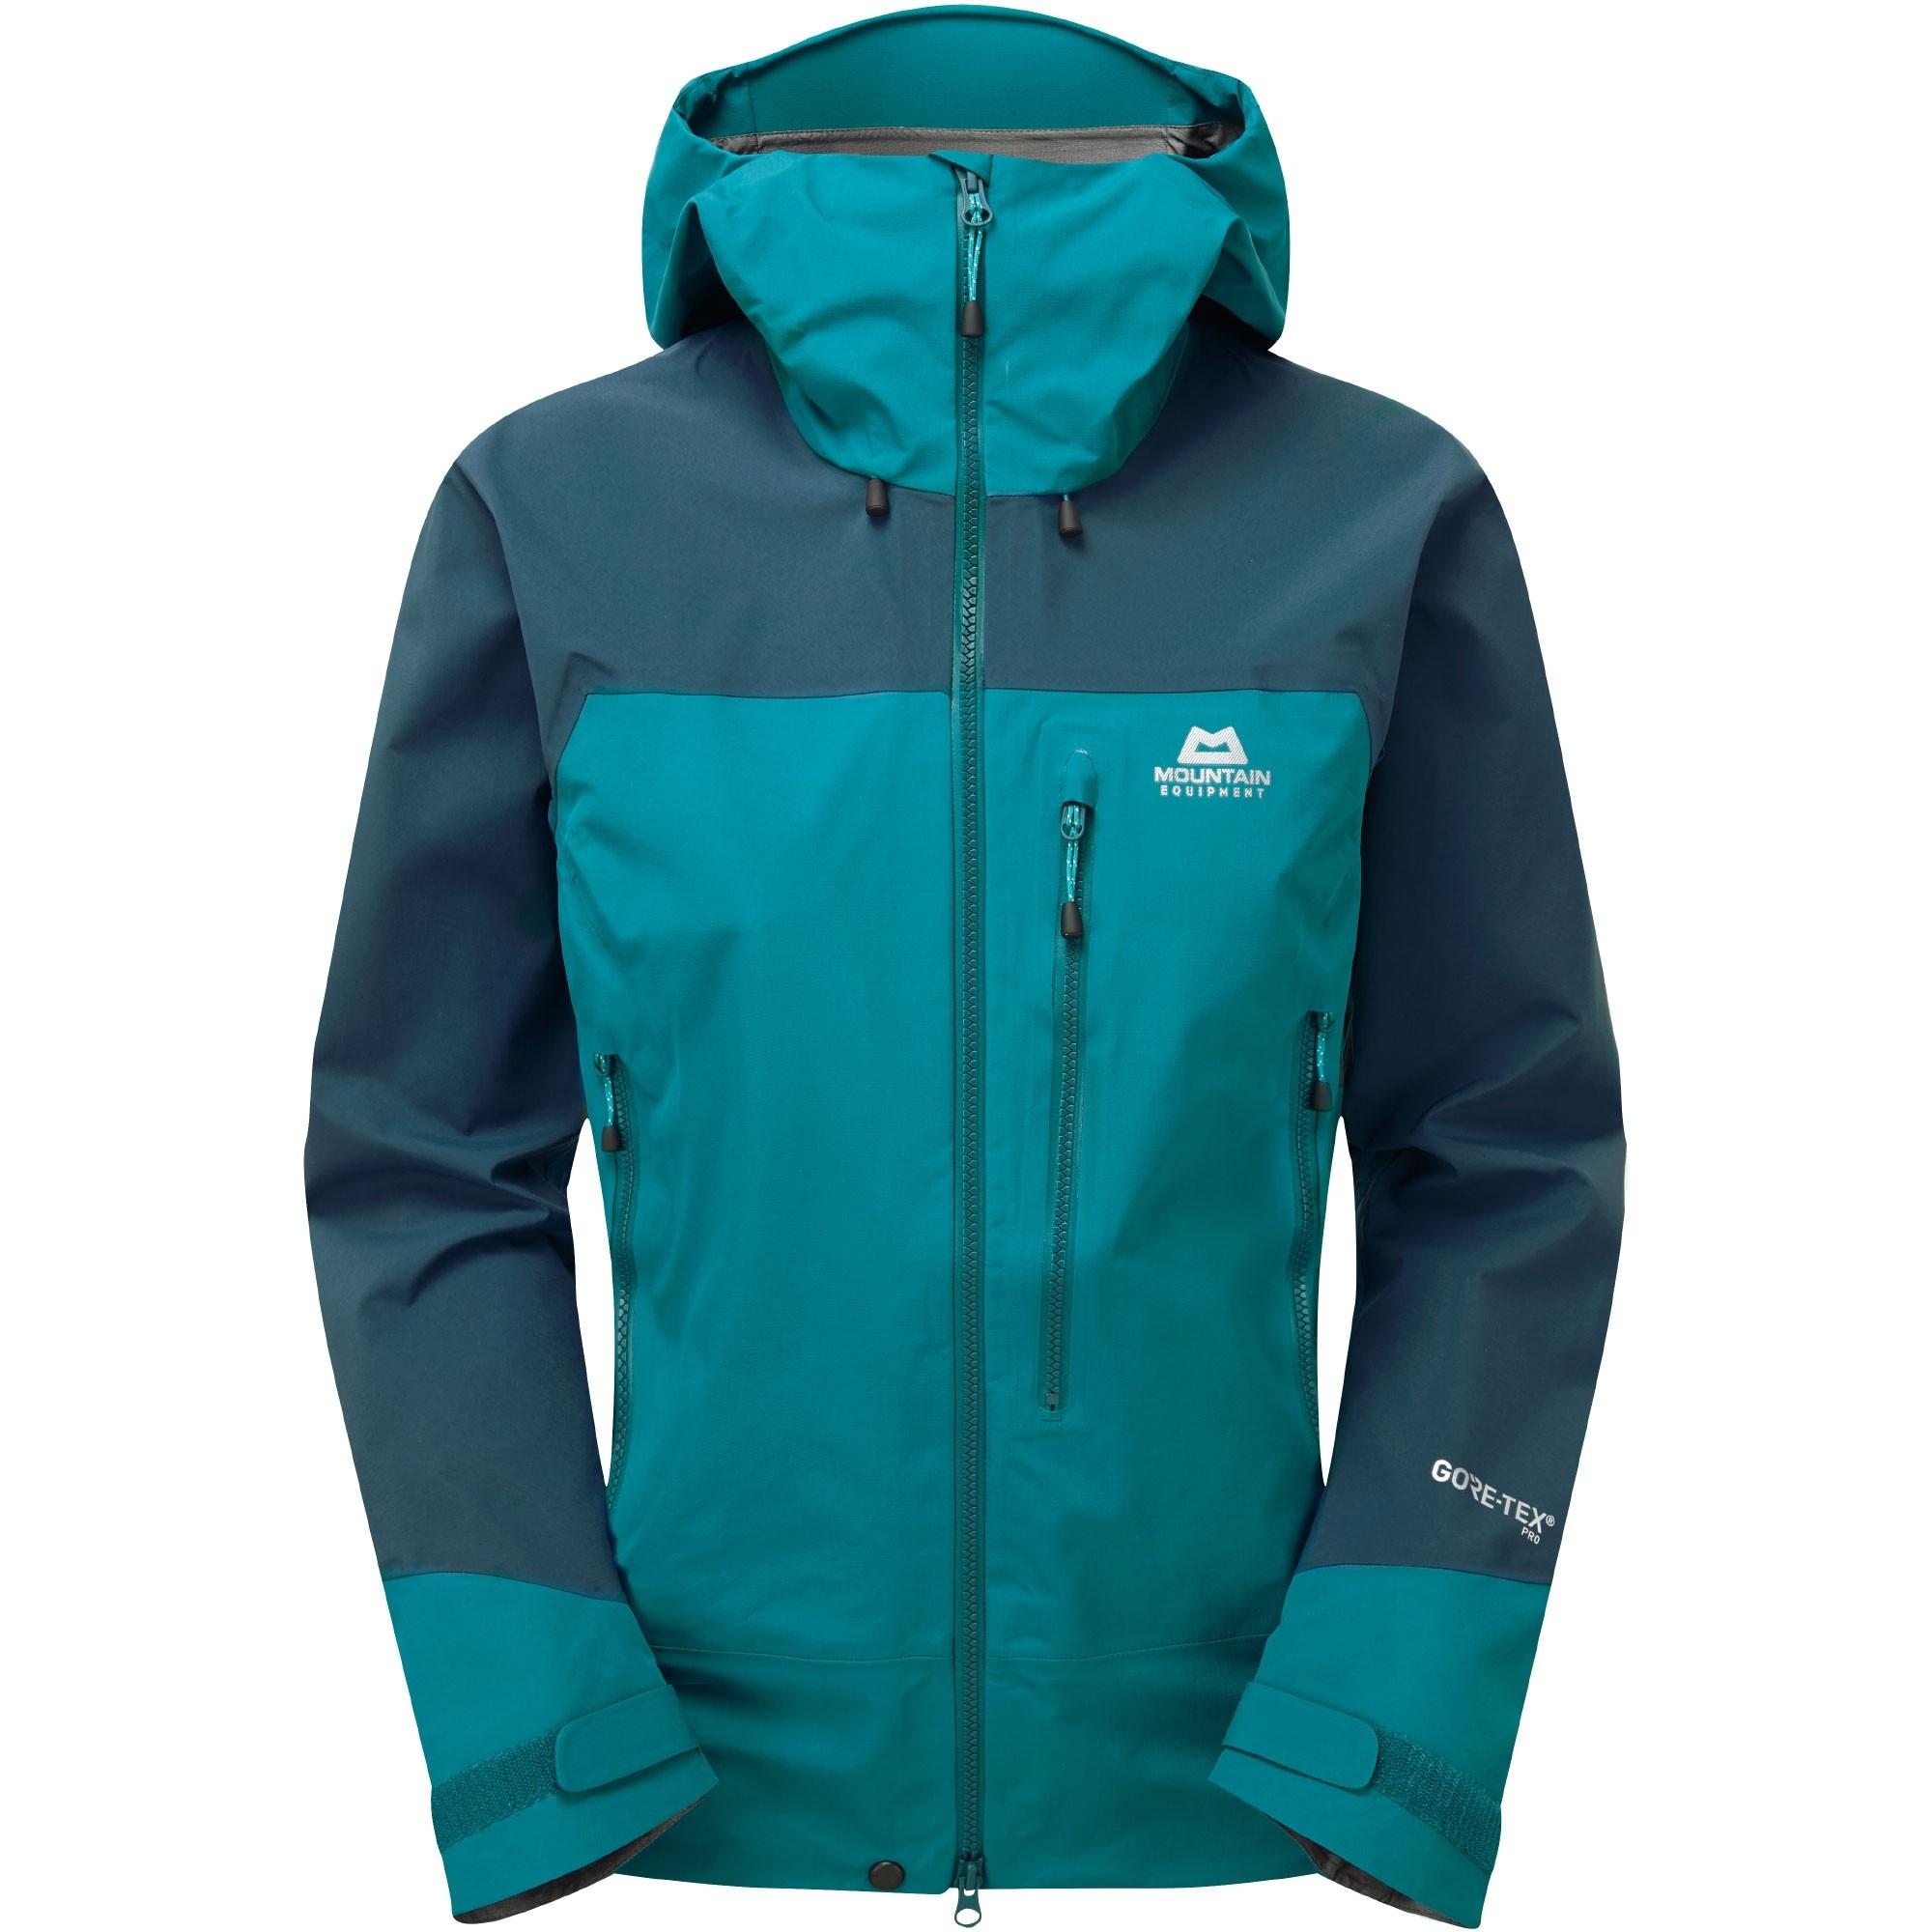 Mountain Equipment Manaslu Waterproof Jacket - Tasman Blue